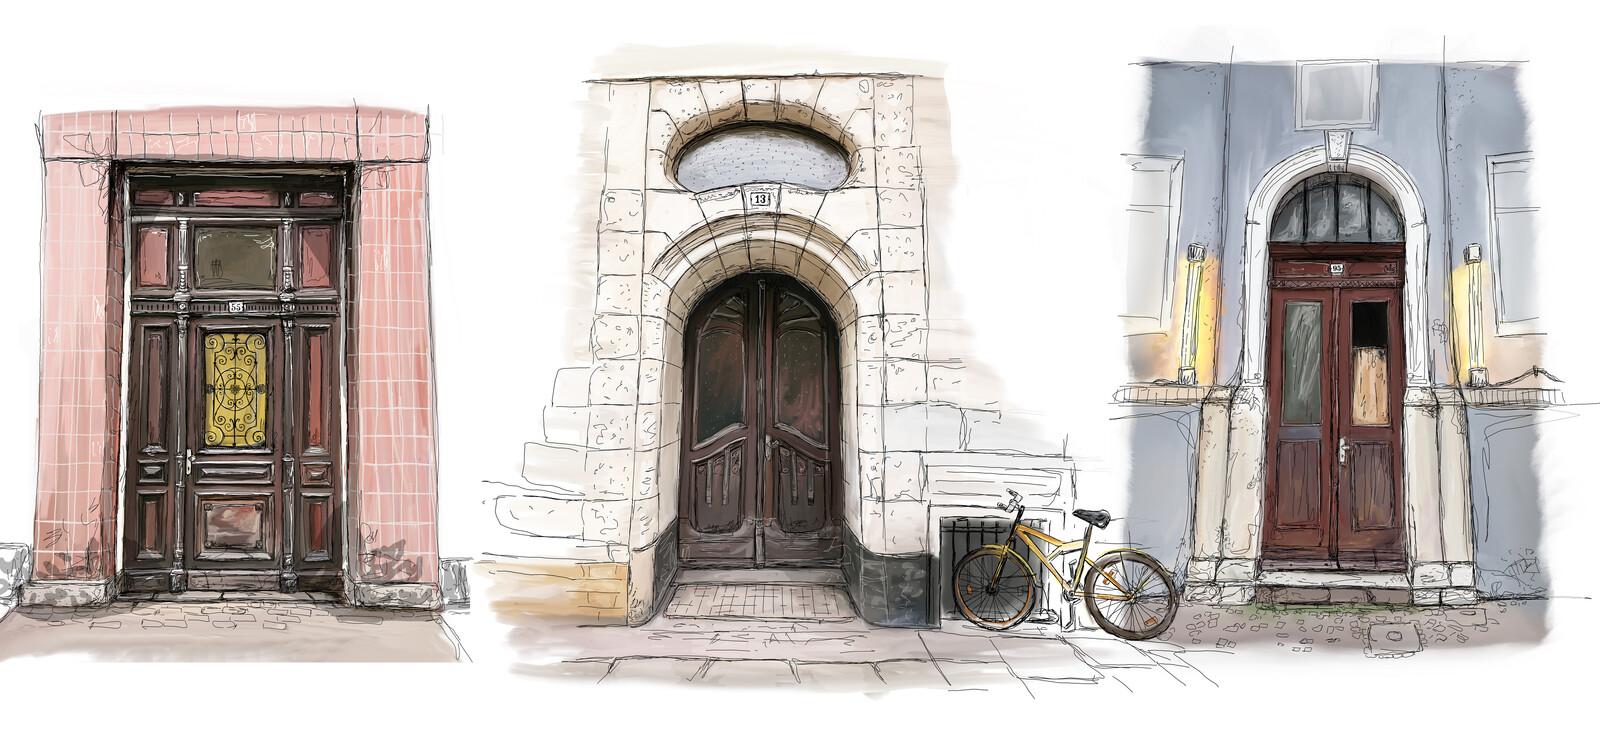 3 Brown Doors, color concepts